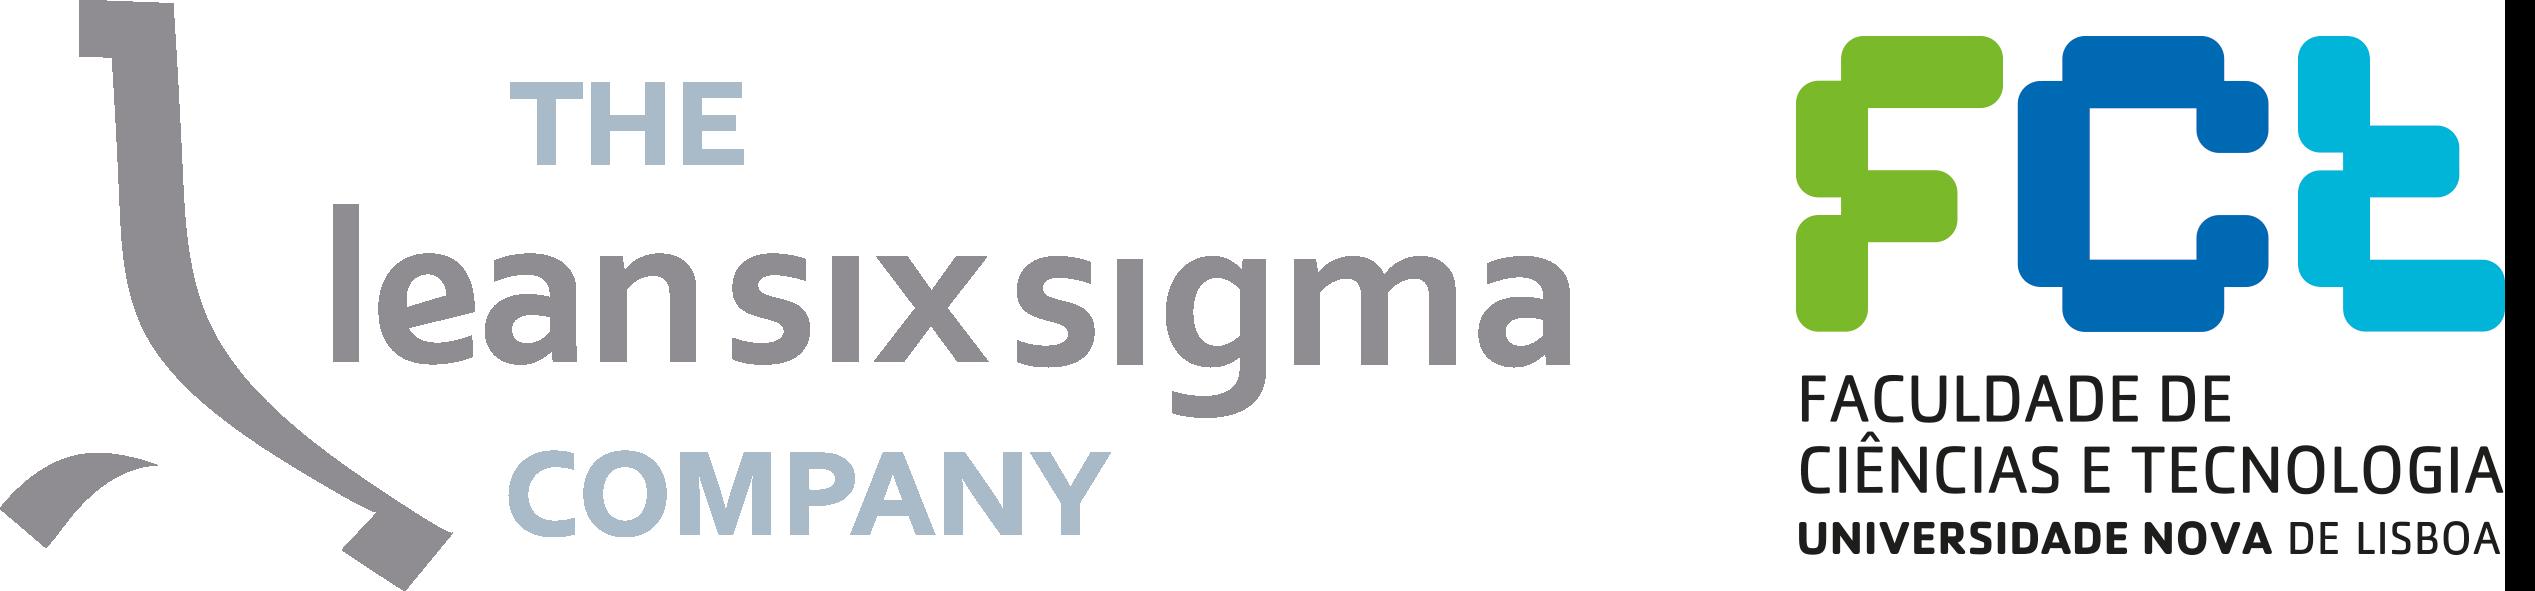 theleansixsigmacompany.pt/en